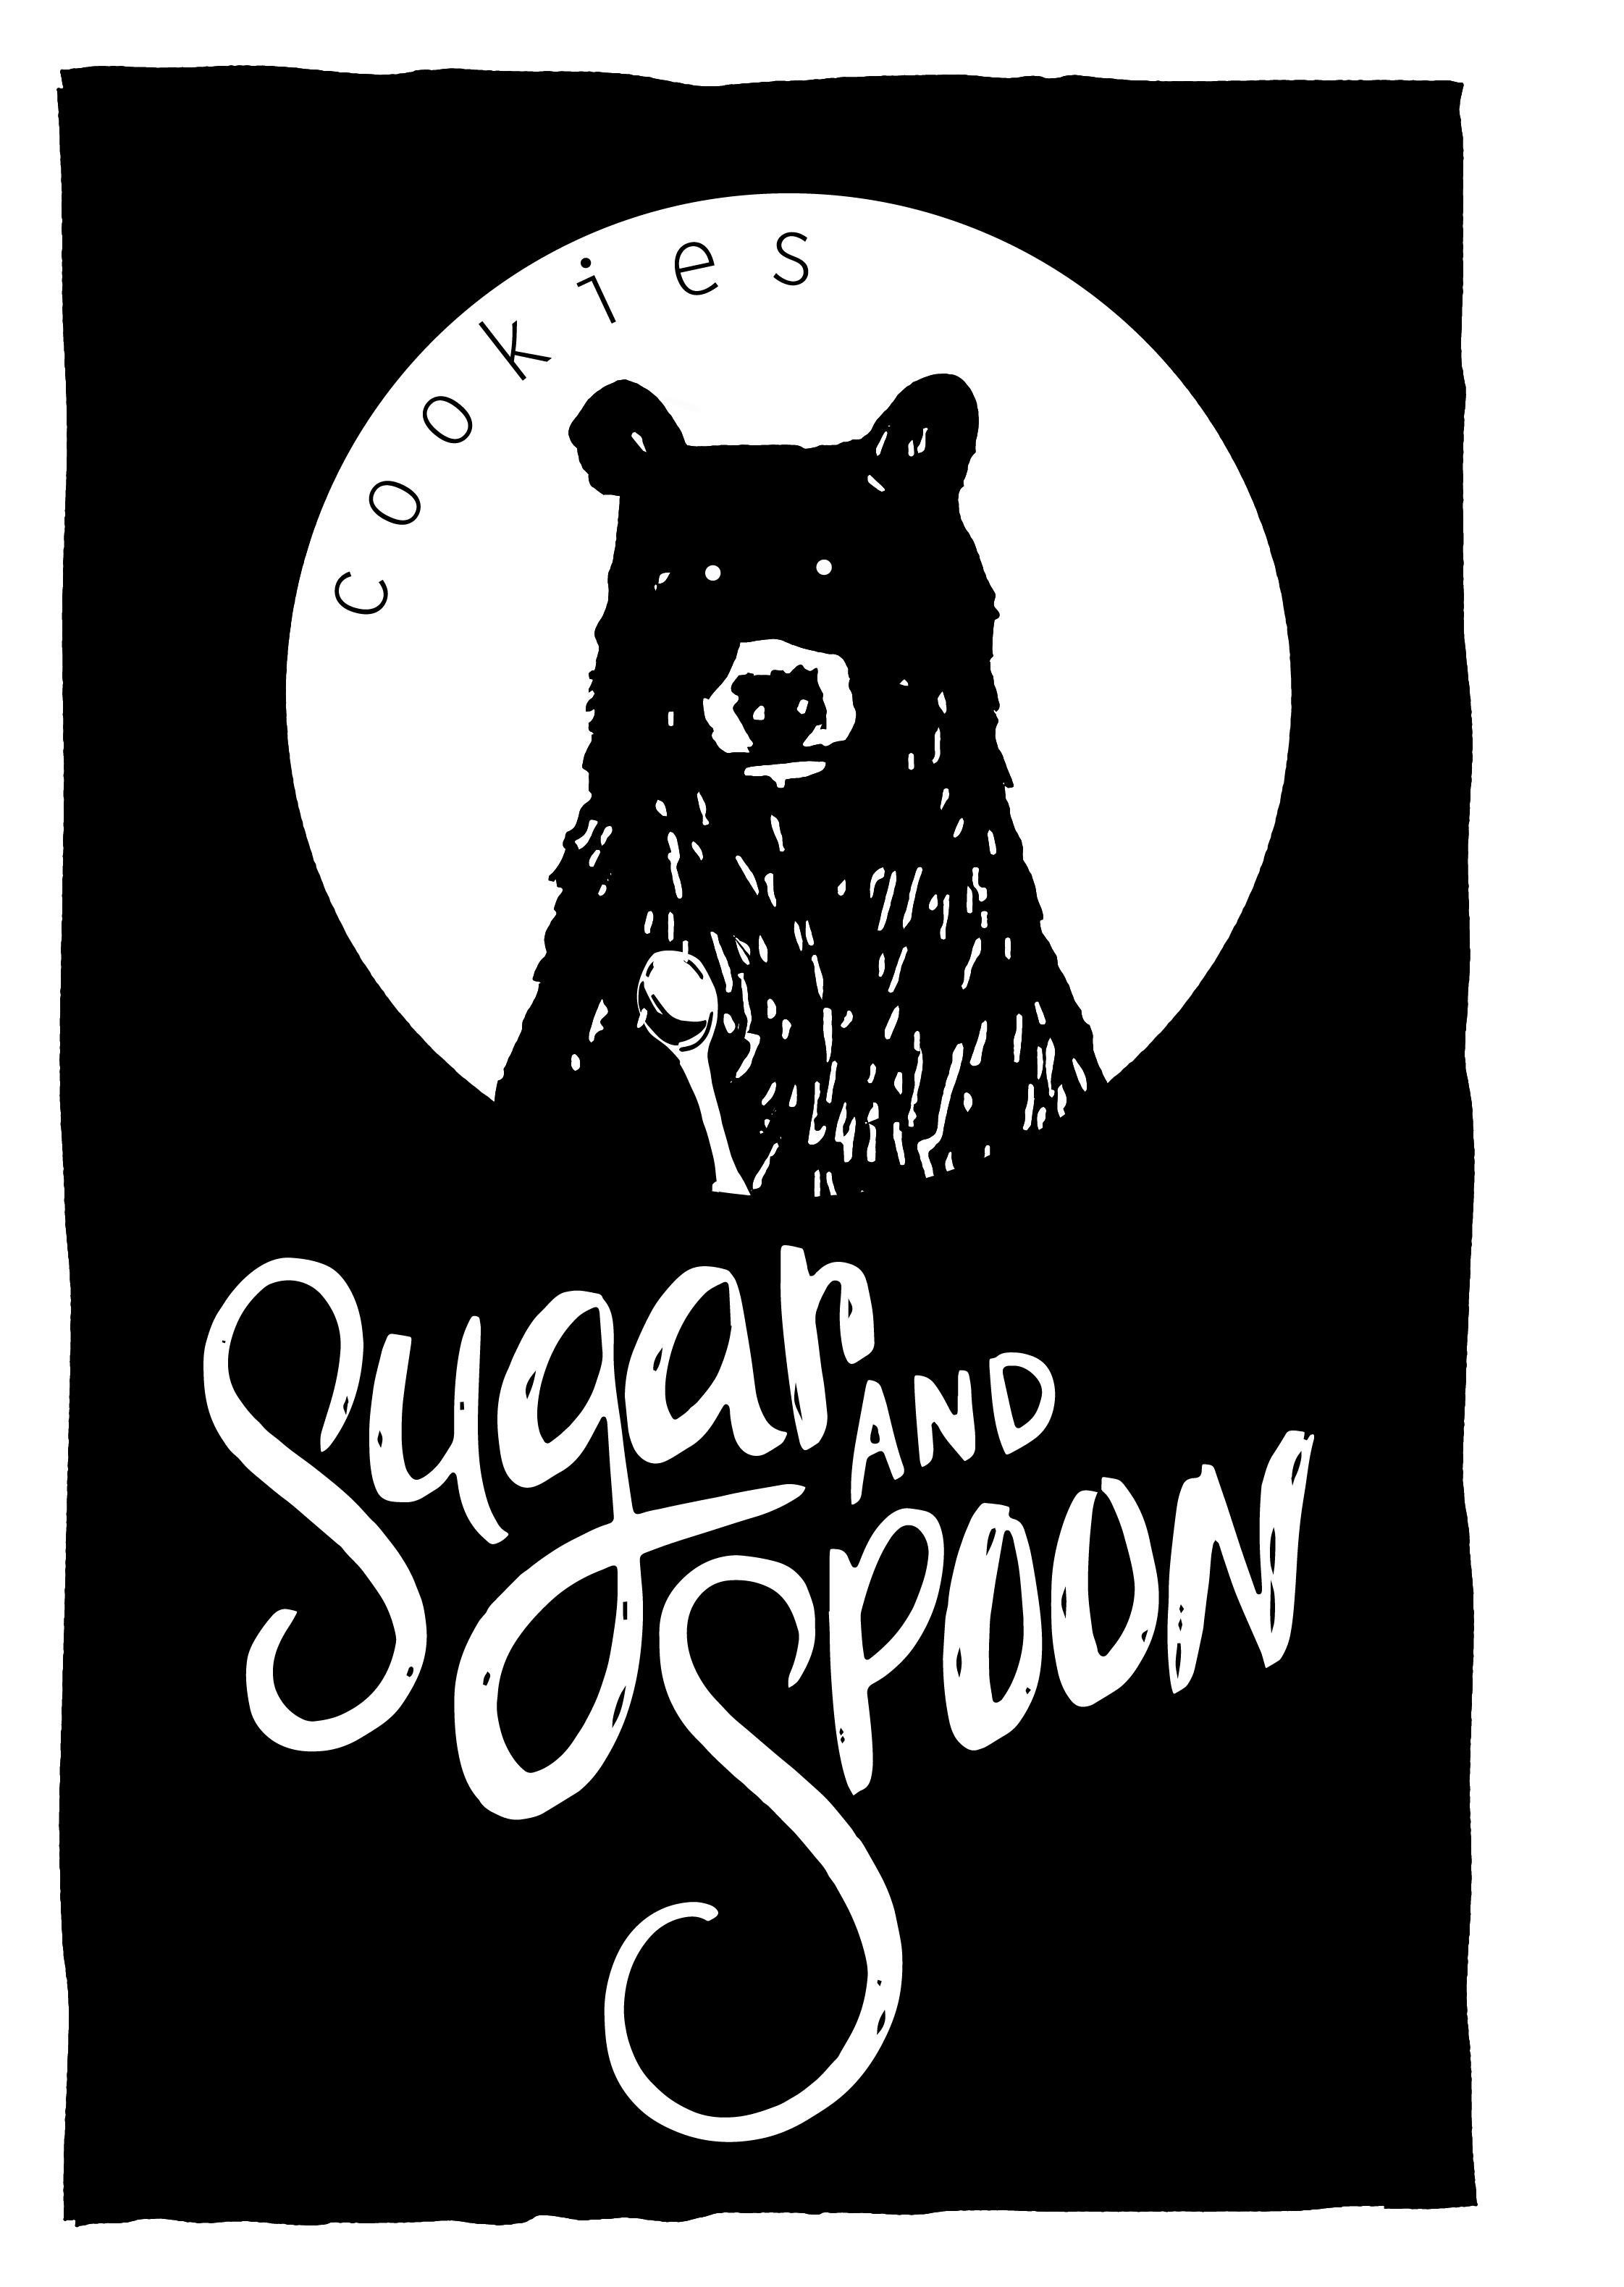 sugarandspoon-01.jpg